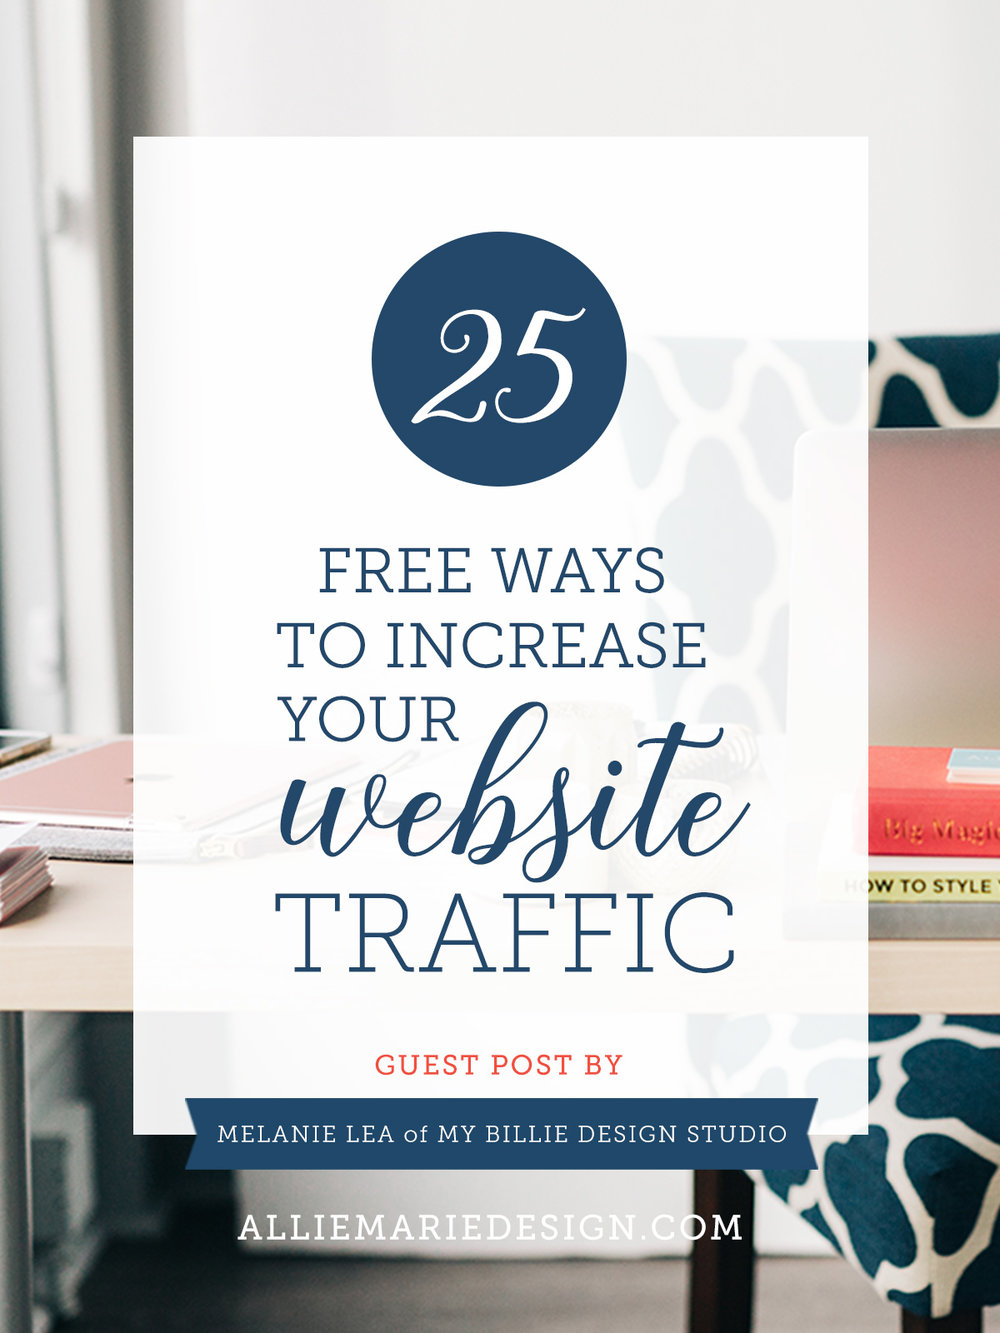 25 Free Ways to Increase Website Traffic  |  Guest Blog Post by Melanie Lea of My Billie Design Studio  |  SEO Tips, Marketing Tips, Blogging Tips, Website Tips  |  AllieMarie Design